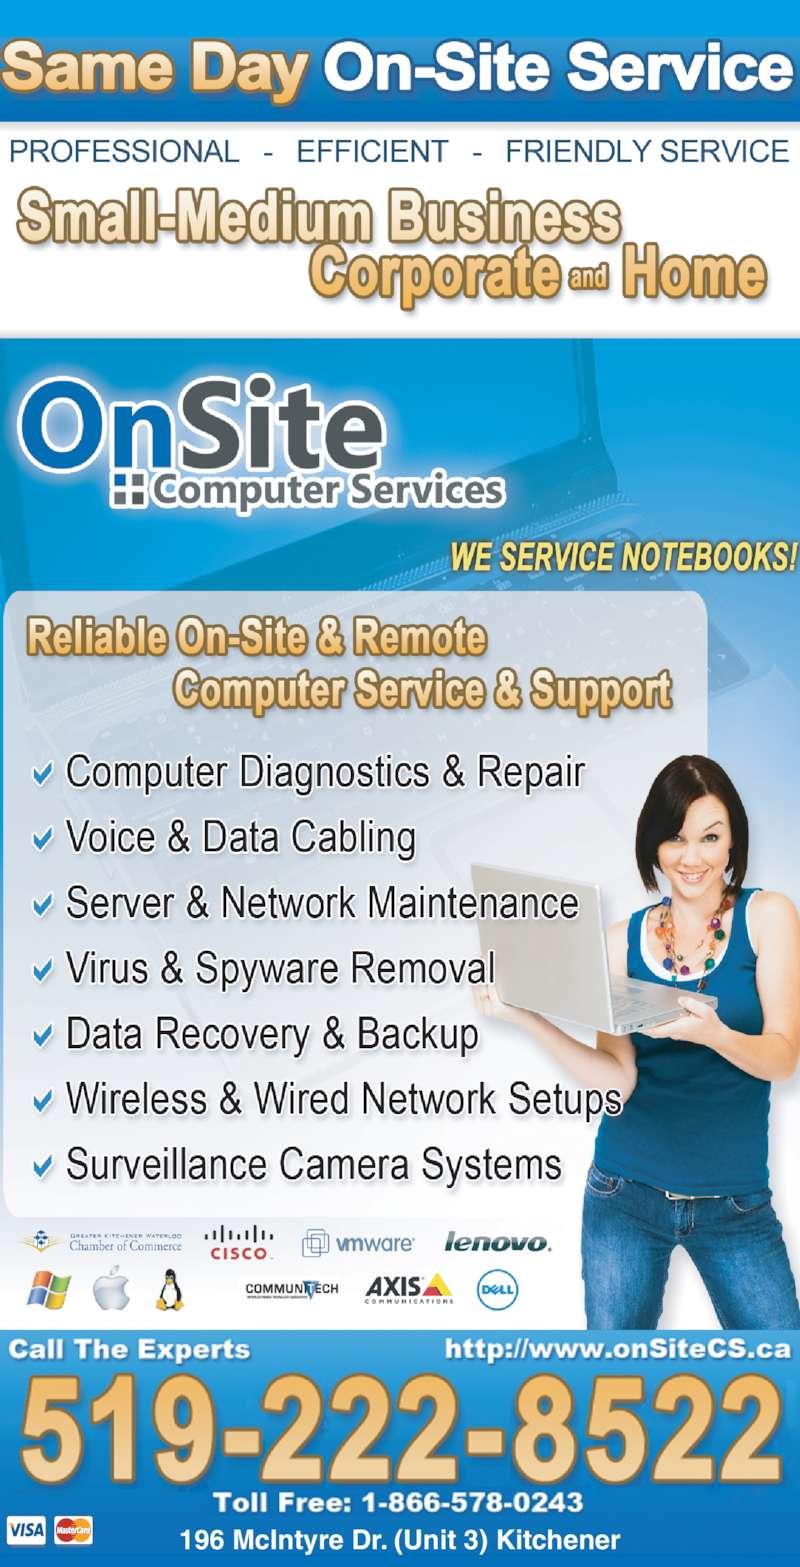 Onsite Computer Services 196 Mcintyre Dr Kitchener On